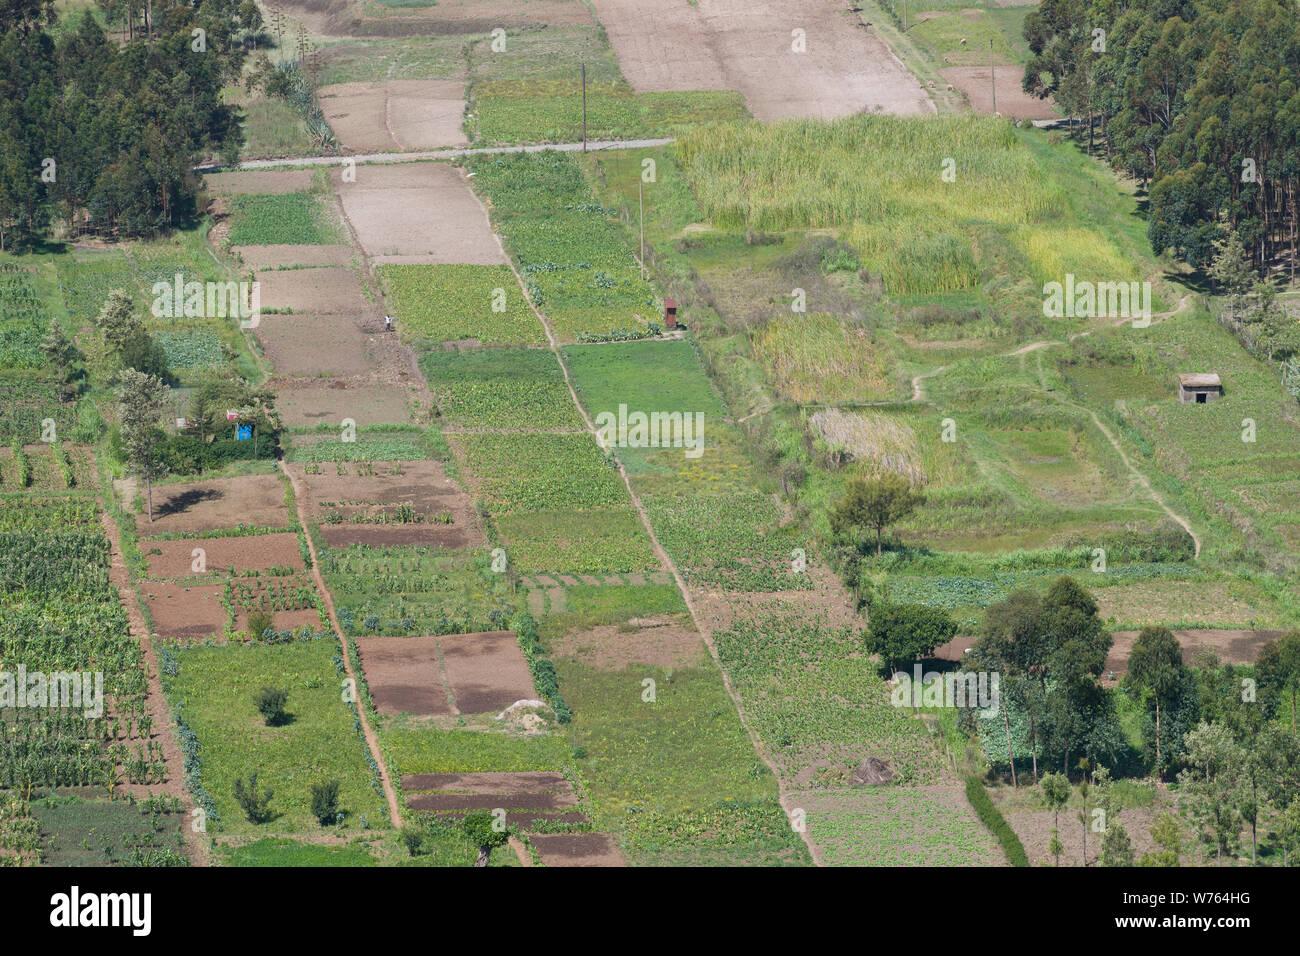 A patchwork of farmers field viewed from the Mahi Mahiu Longonot View Point, on A104 Nakuru - Nairobi road. Rift Valley, Kenya. Stock Photo